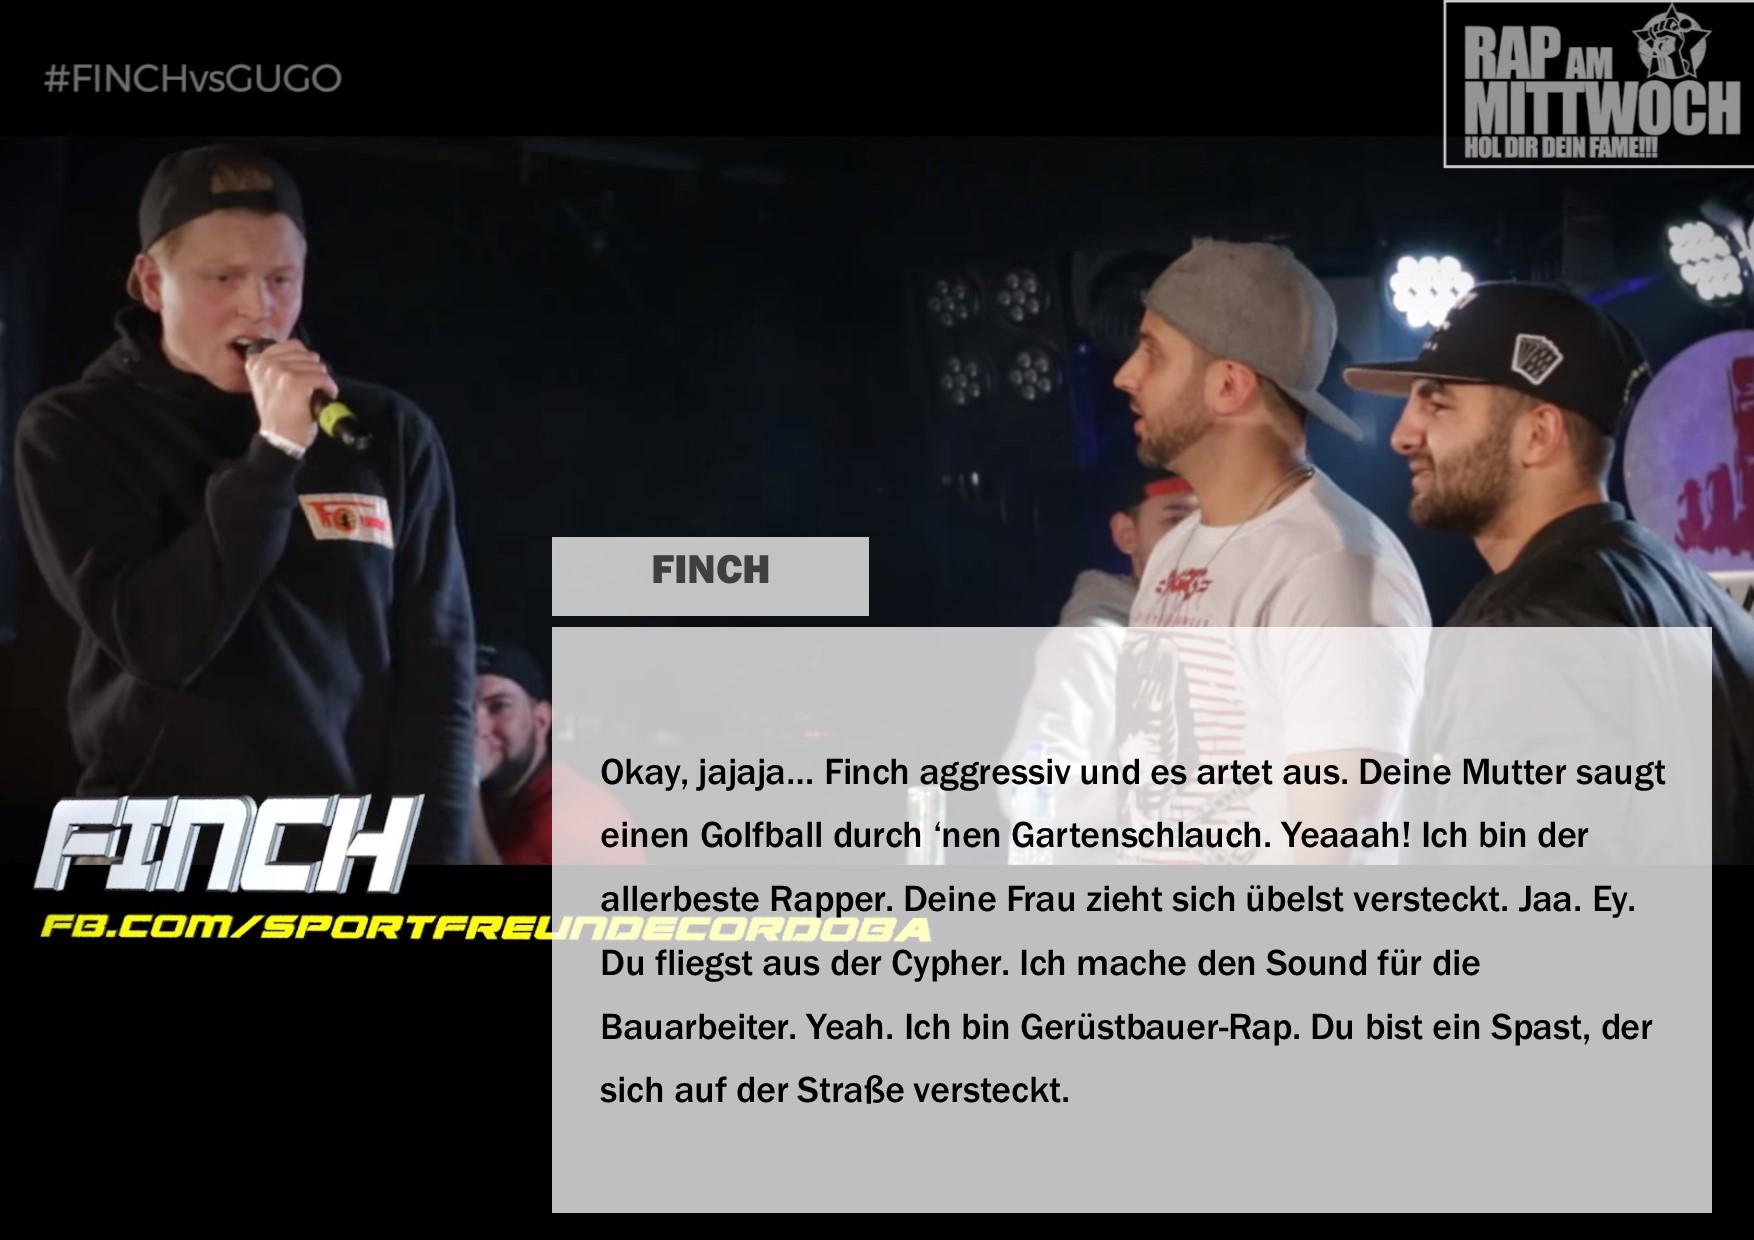 Gugo-vs-Finch-6